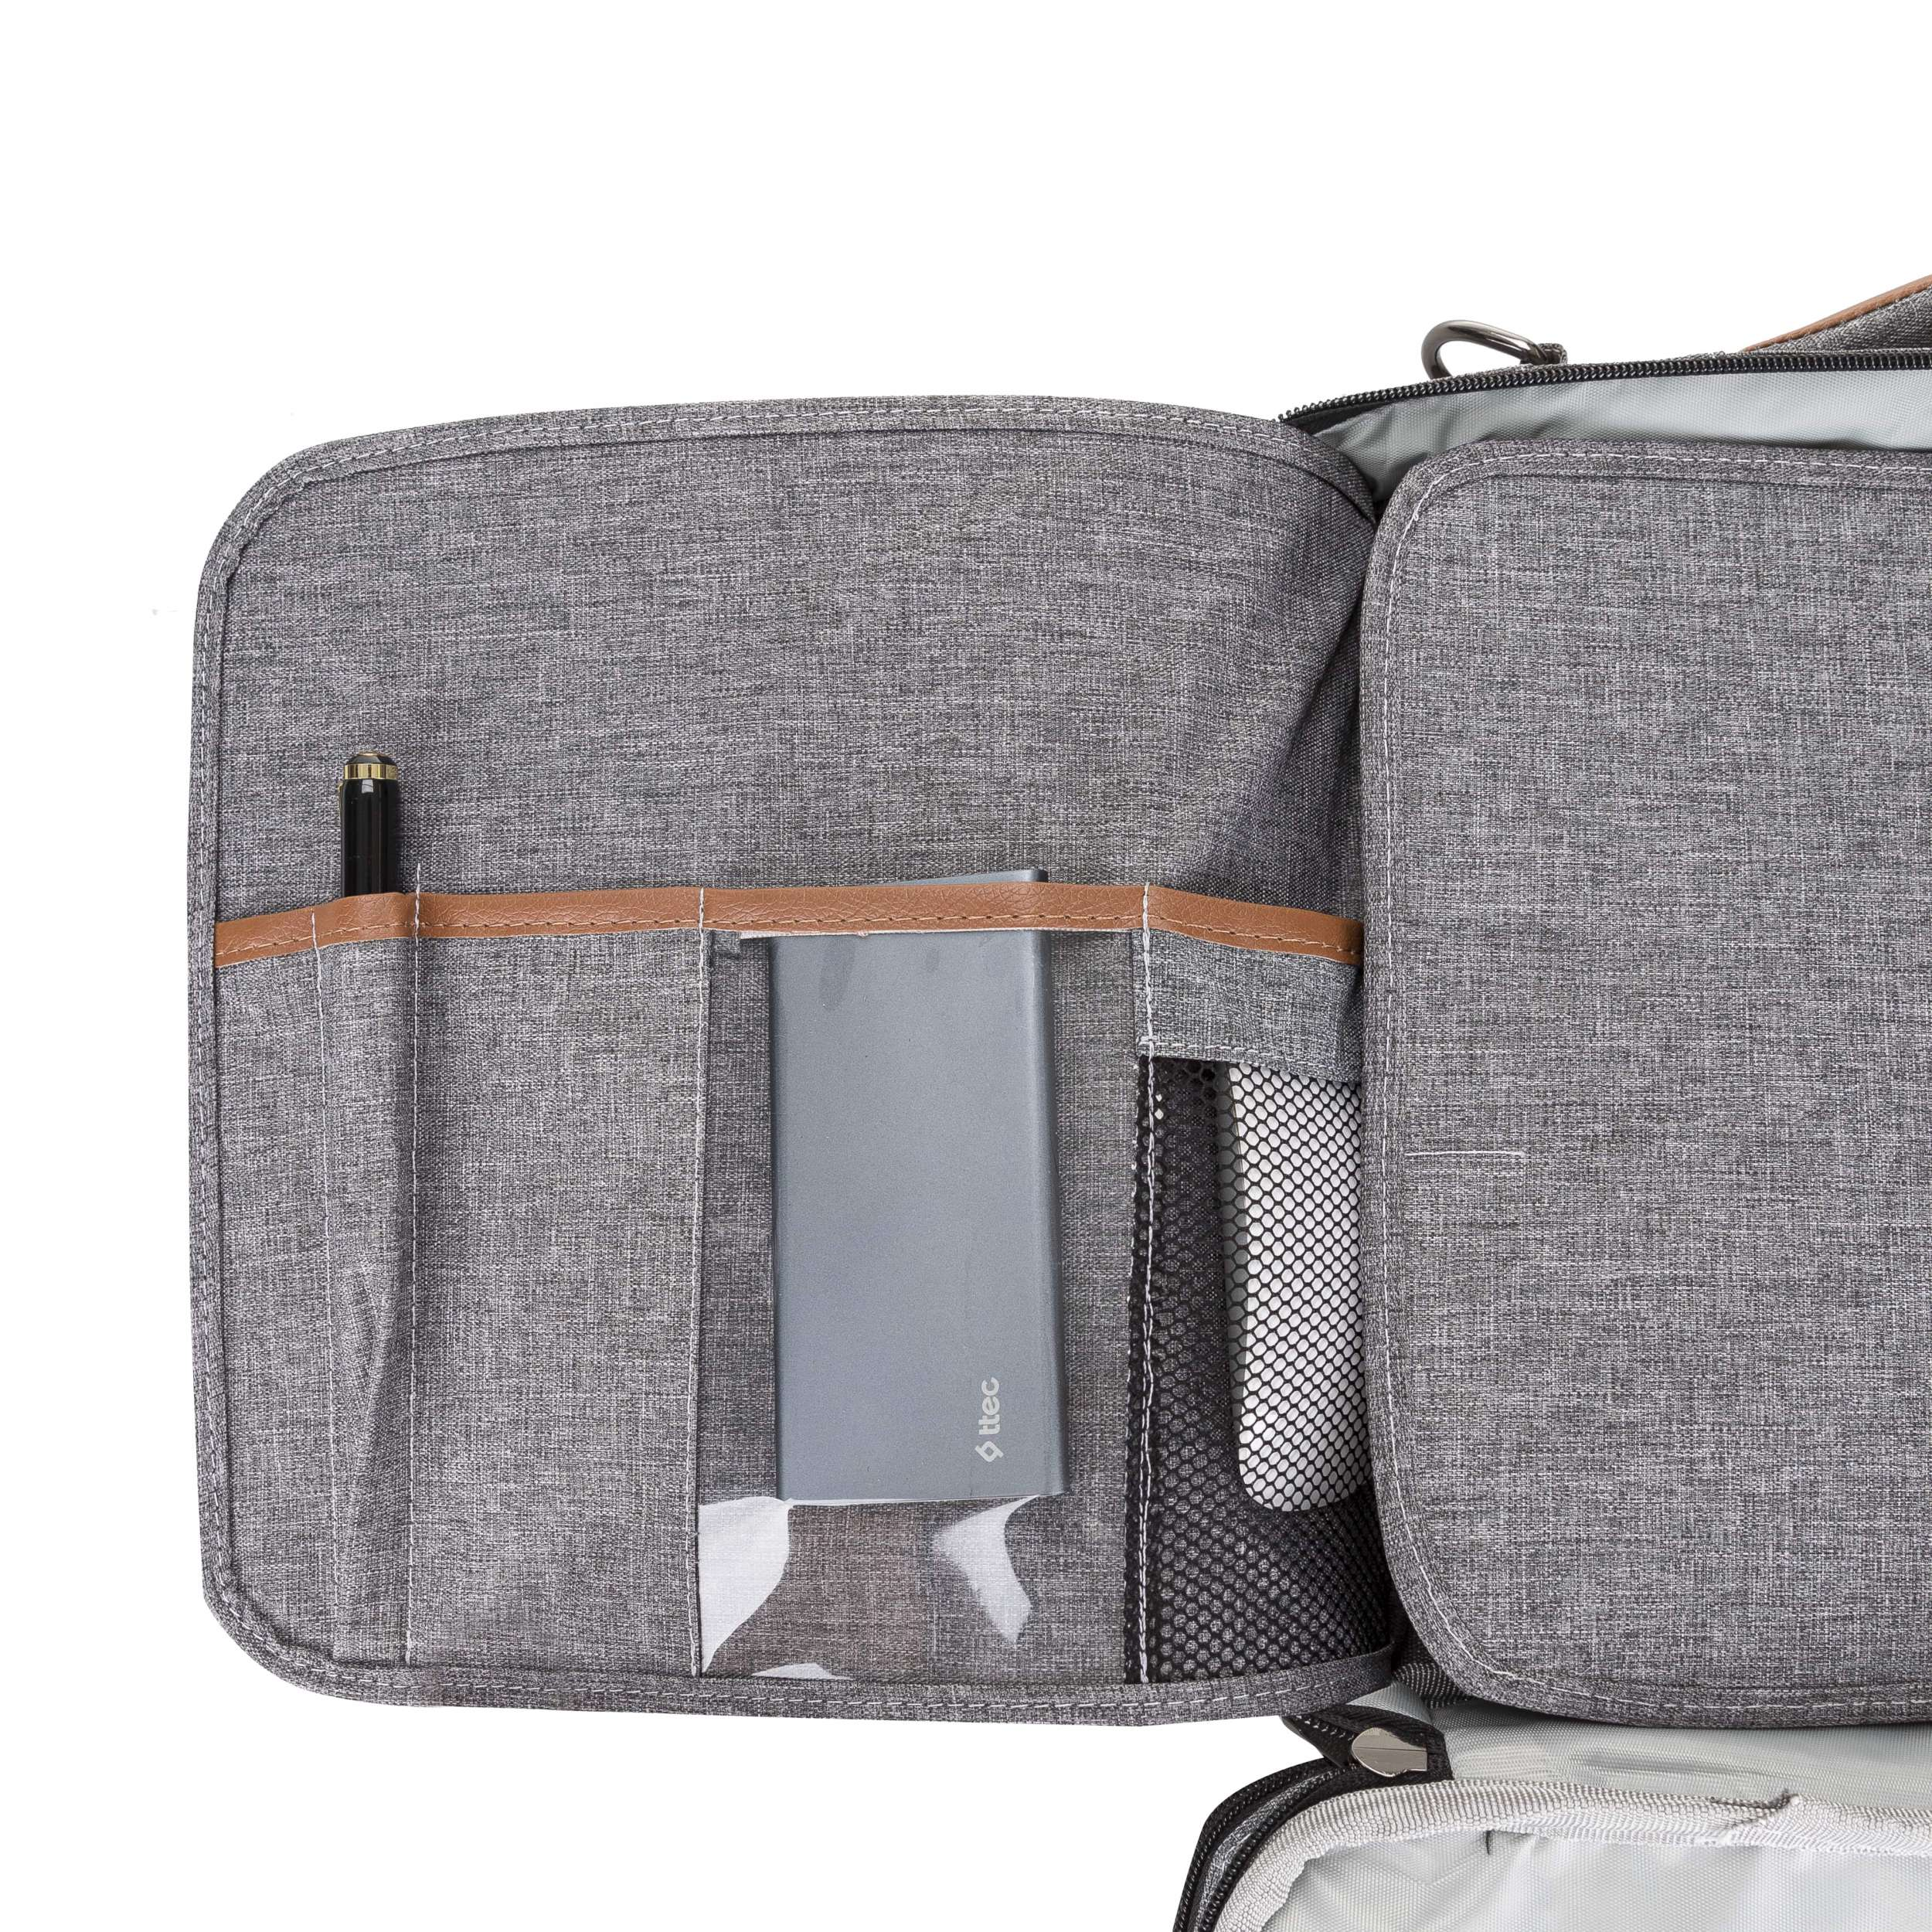 PT 16 inç SmartPack Notebook Çantası Gri